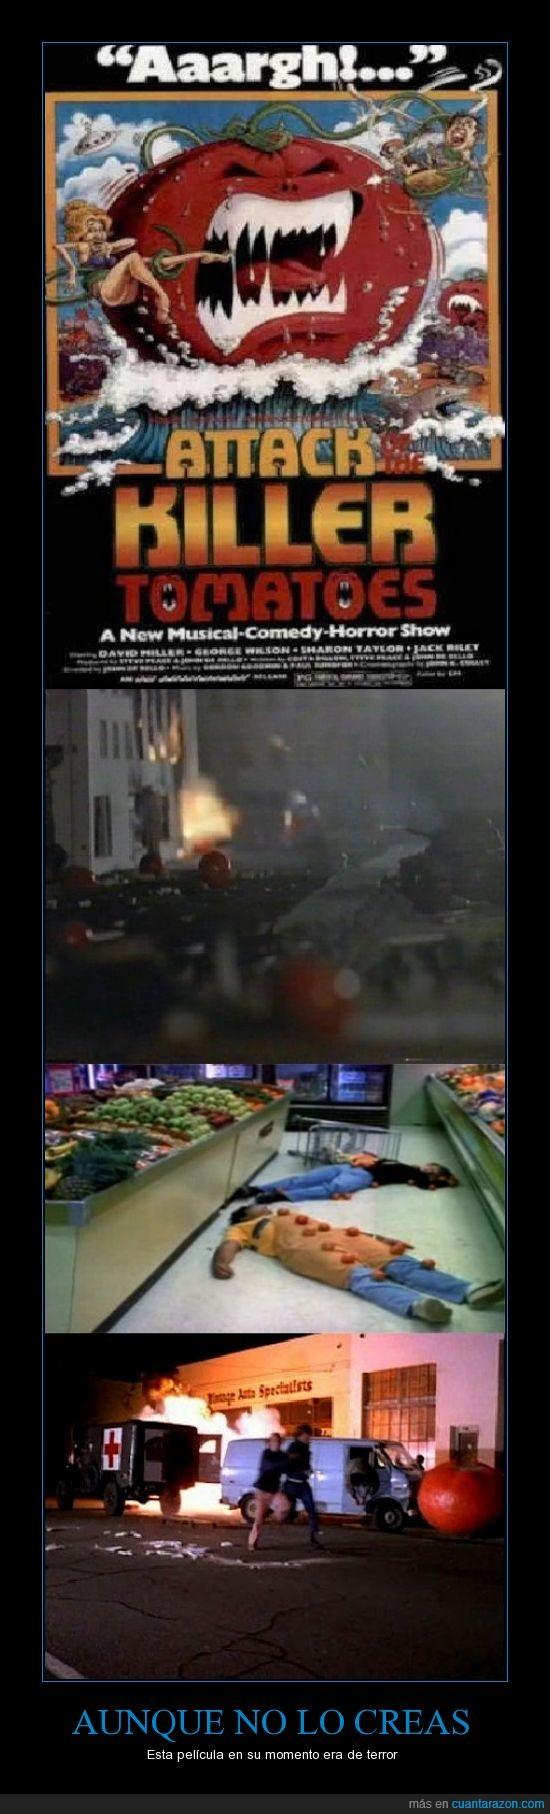 asesinos,el ketchup me da fobia,killer,terror,tomates,tomatoes